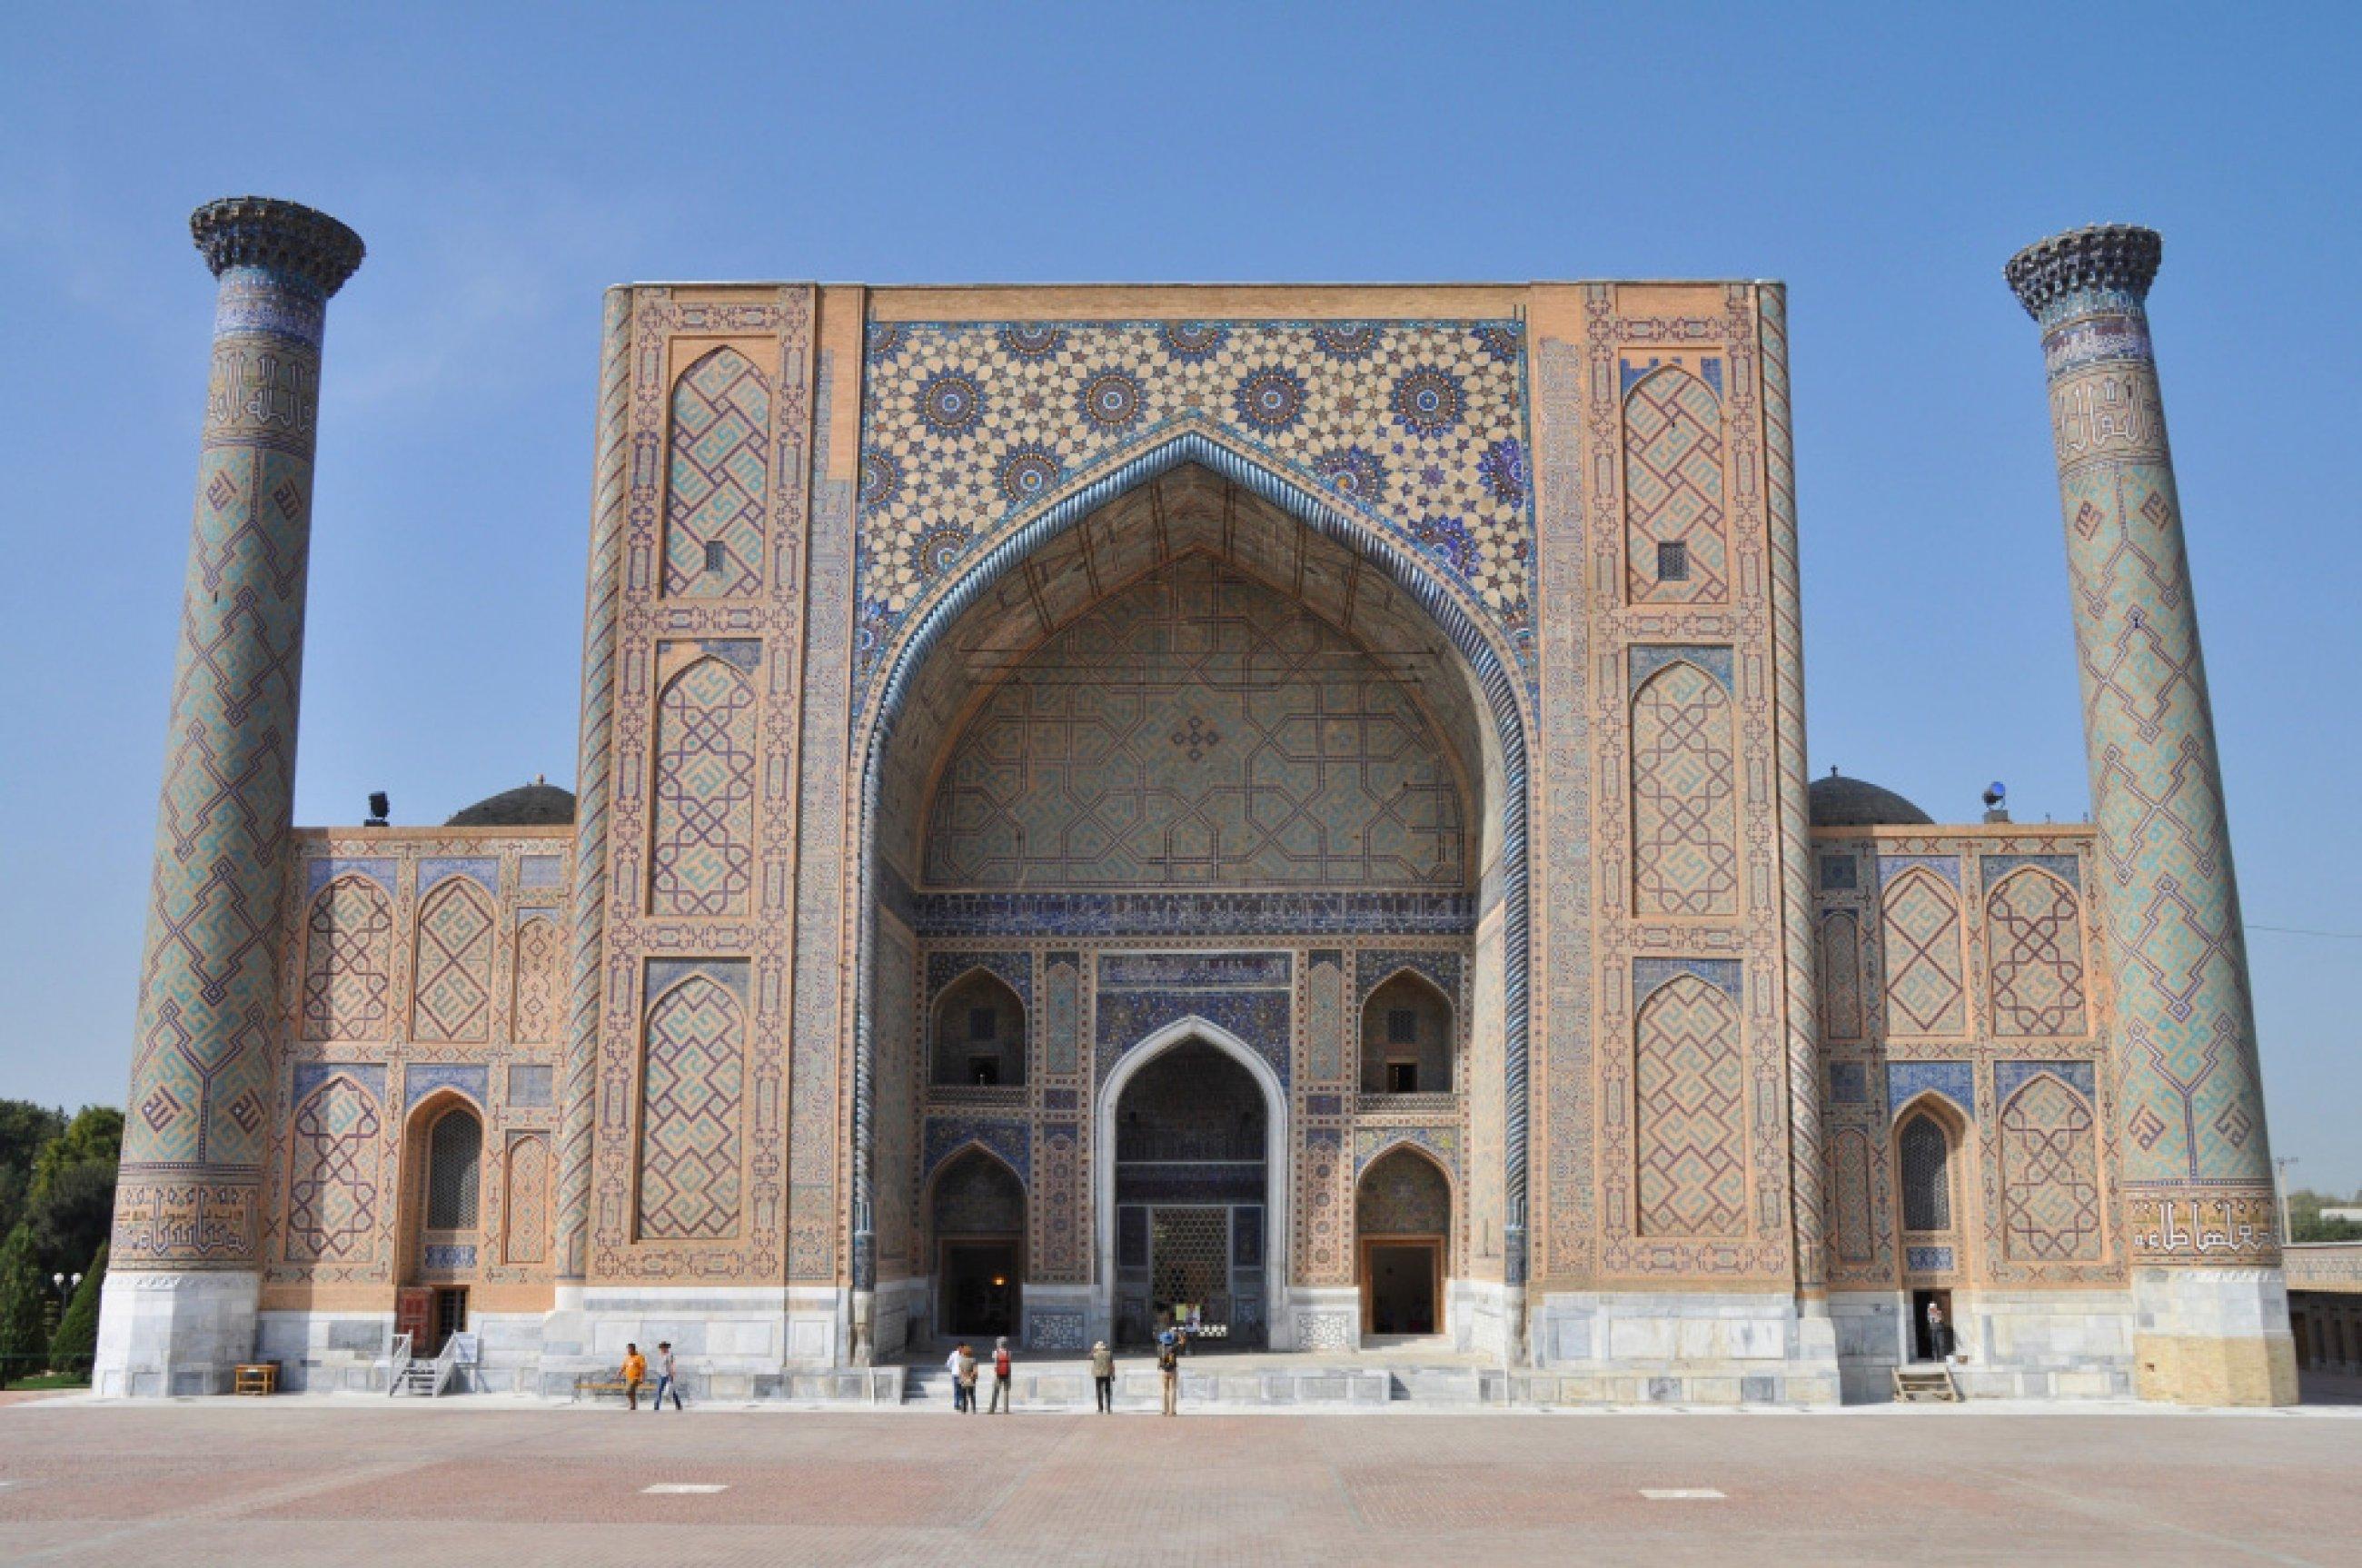 https://bubo.sk/uploads/galleries/3470/uzbekistan-21.jpg